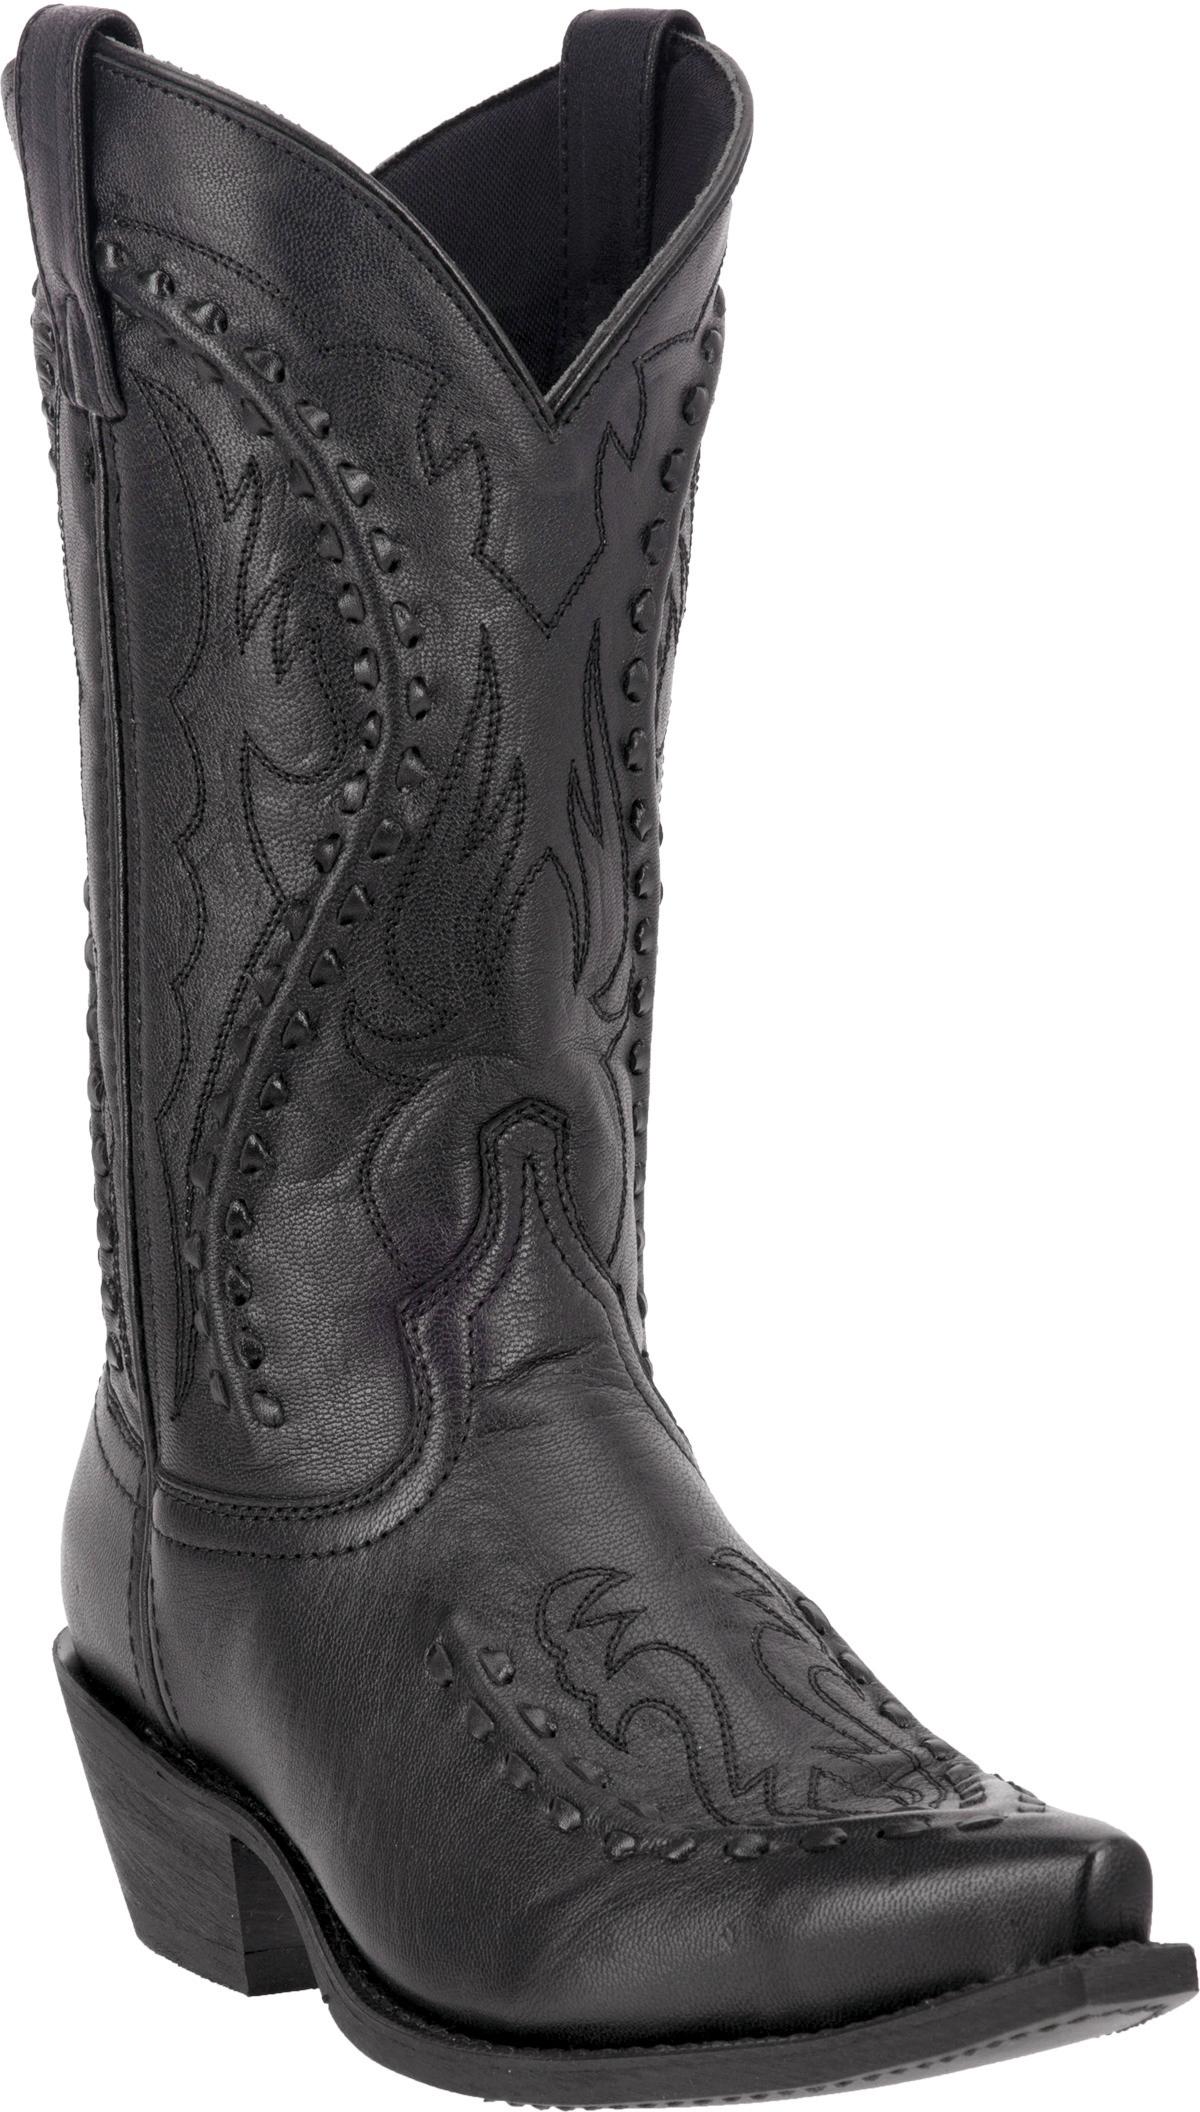 Men&39s Vintage Cowboy Boots - Sheplers